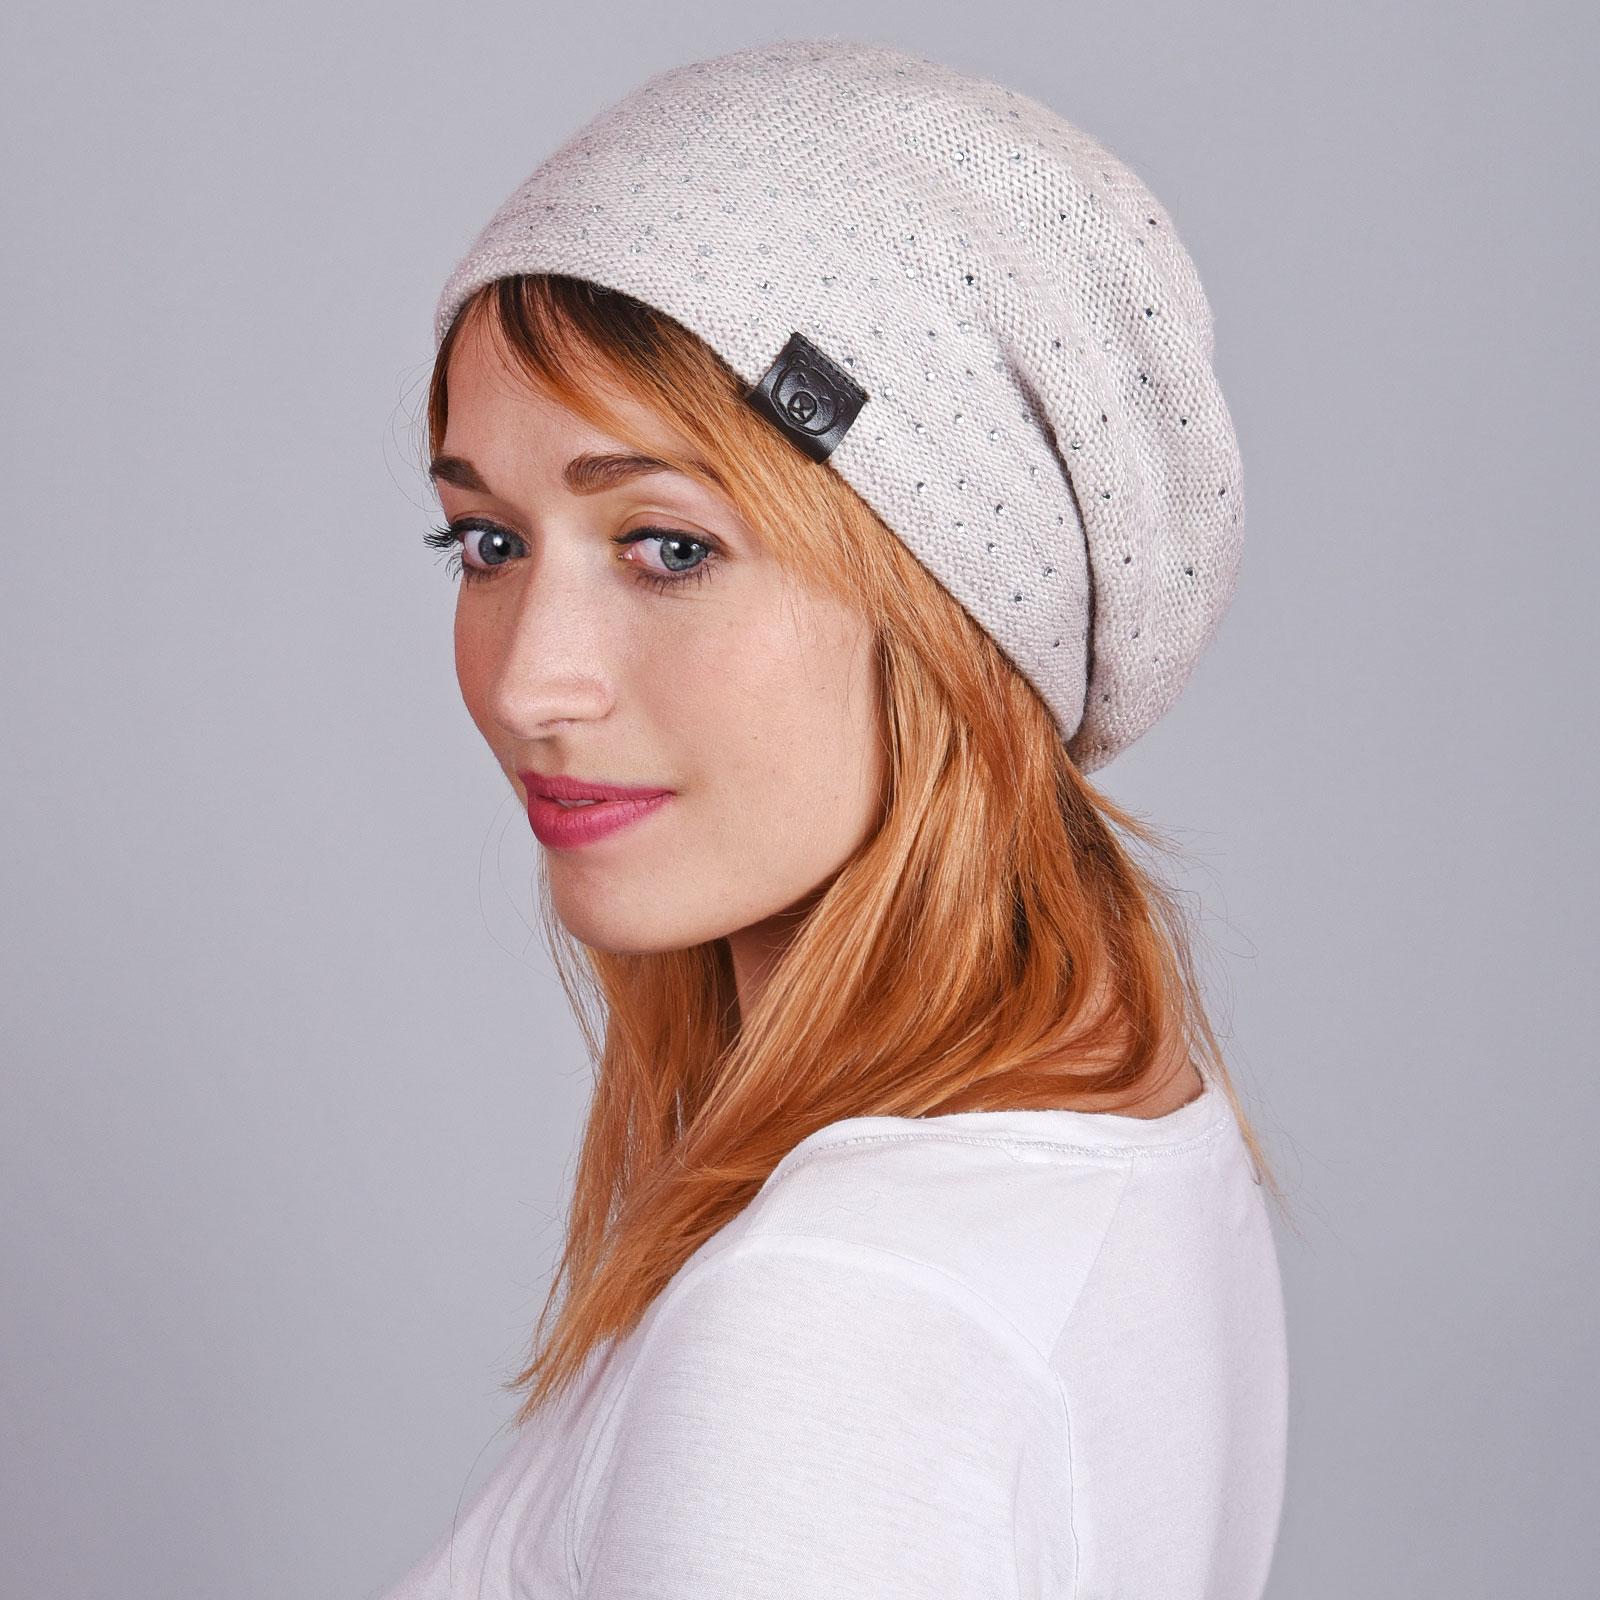 CP-01064-VF16-1-bonnet-femme-inserts-brillants-blanc